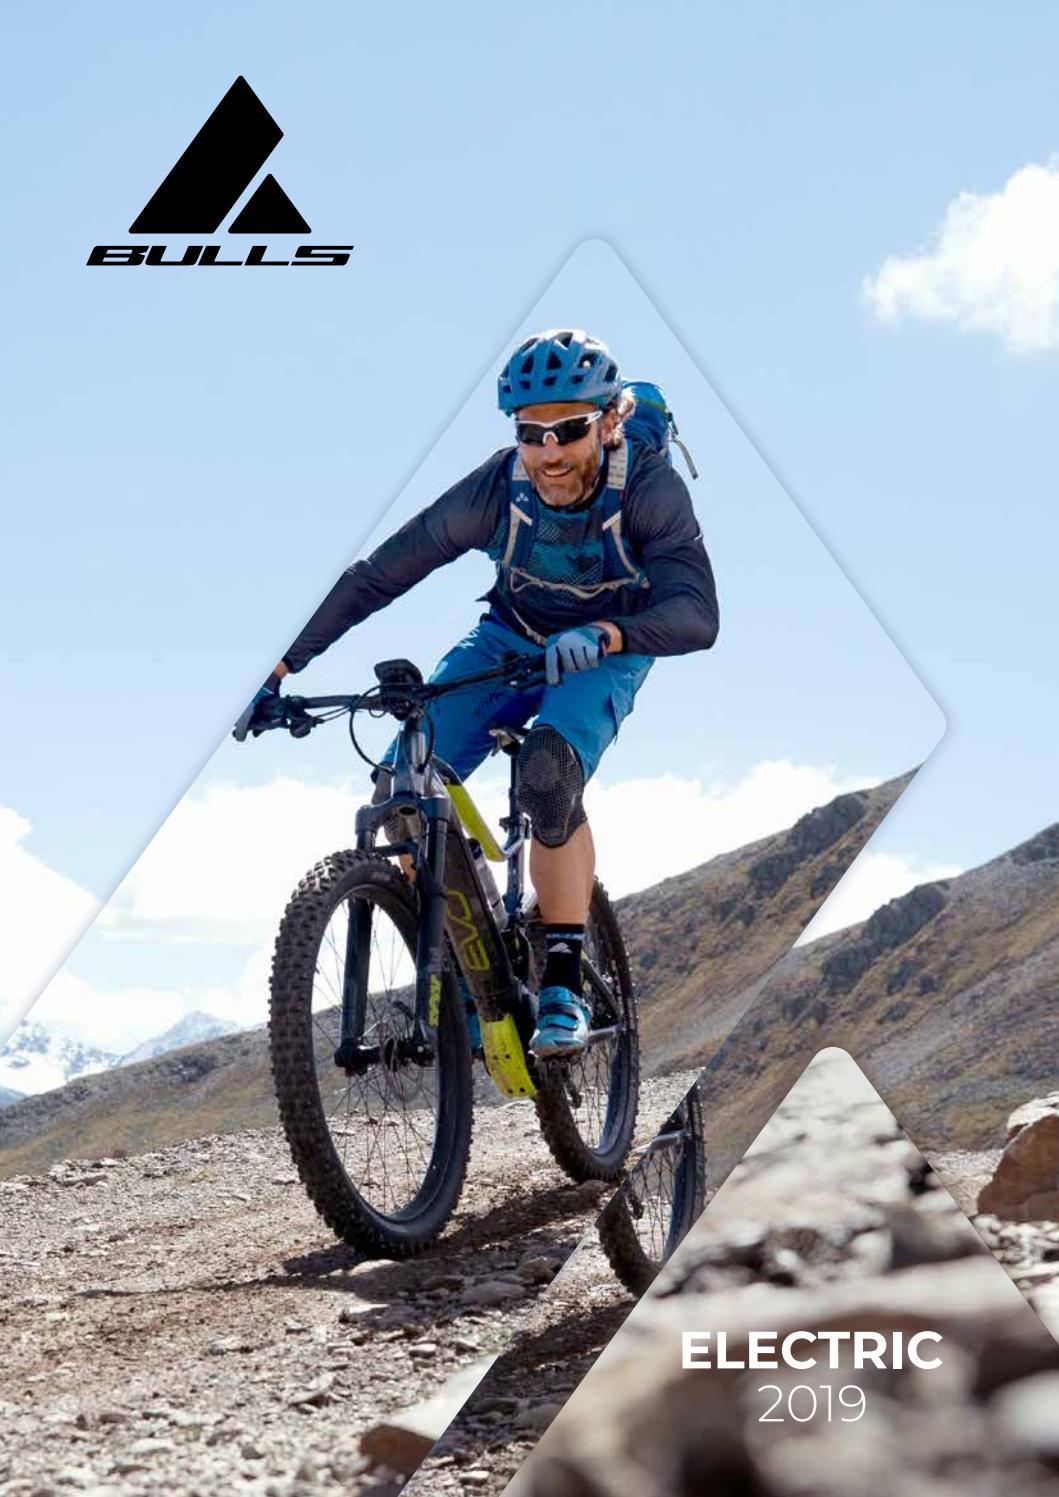 BULLS E-Bike Katalog - 2019 by Axel Köngeter - issuu